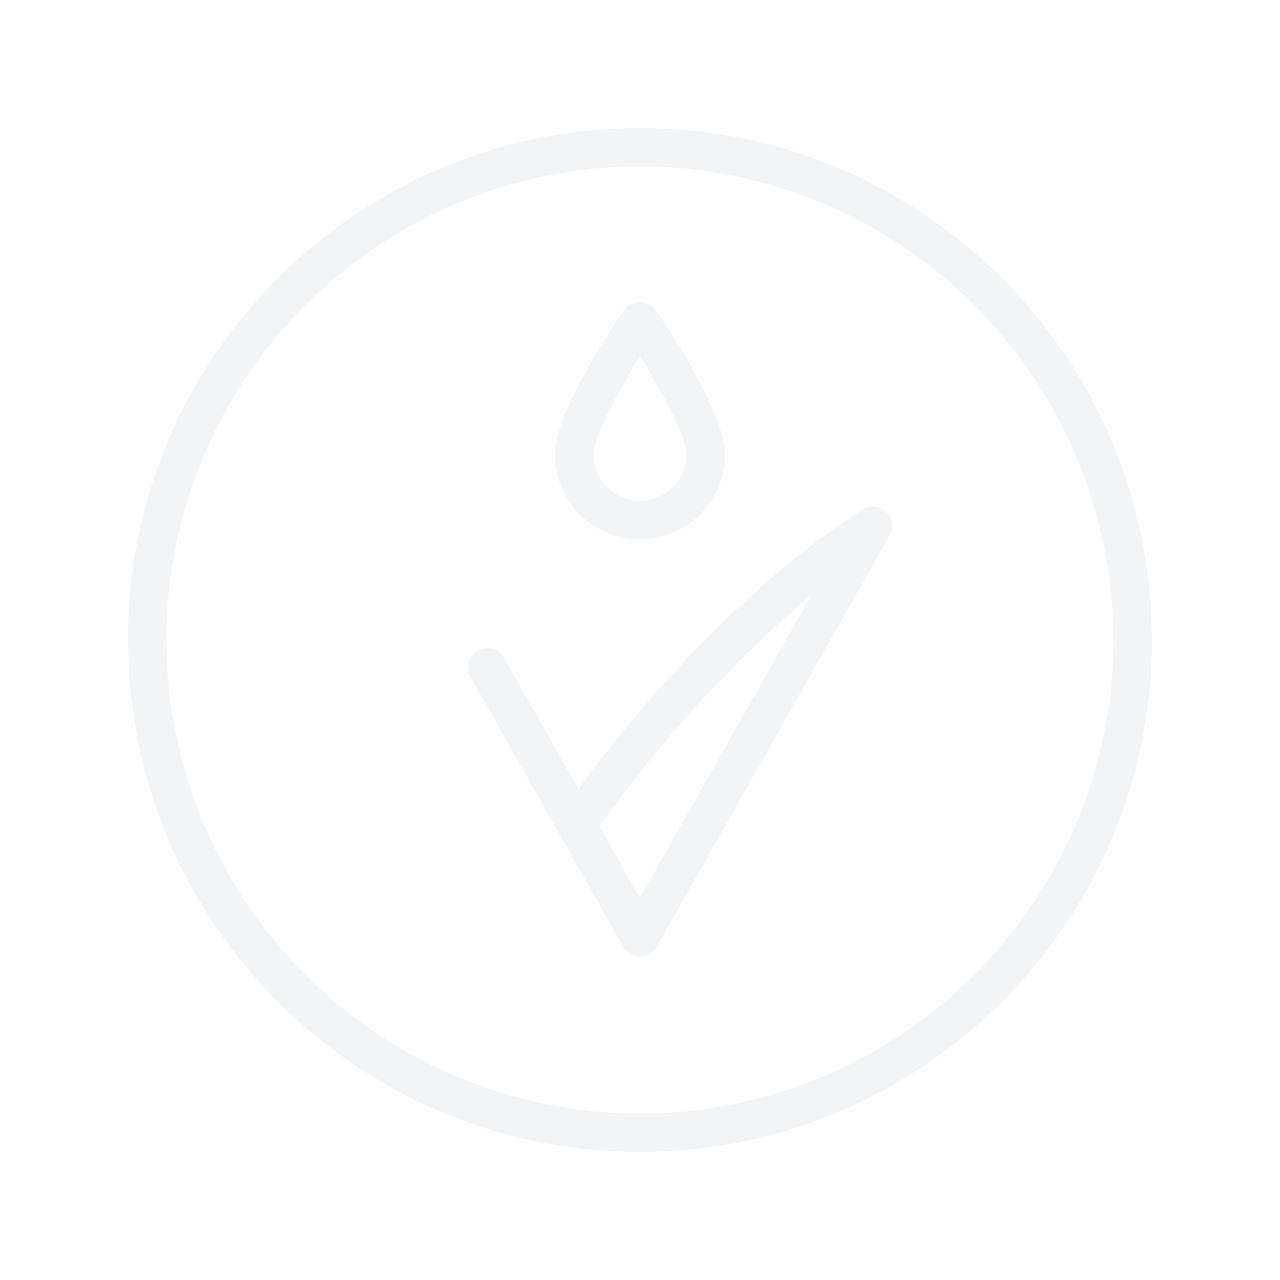 DR IRENA ERIS Neometric Youth Activating Night Cream 50ml